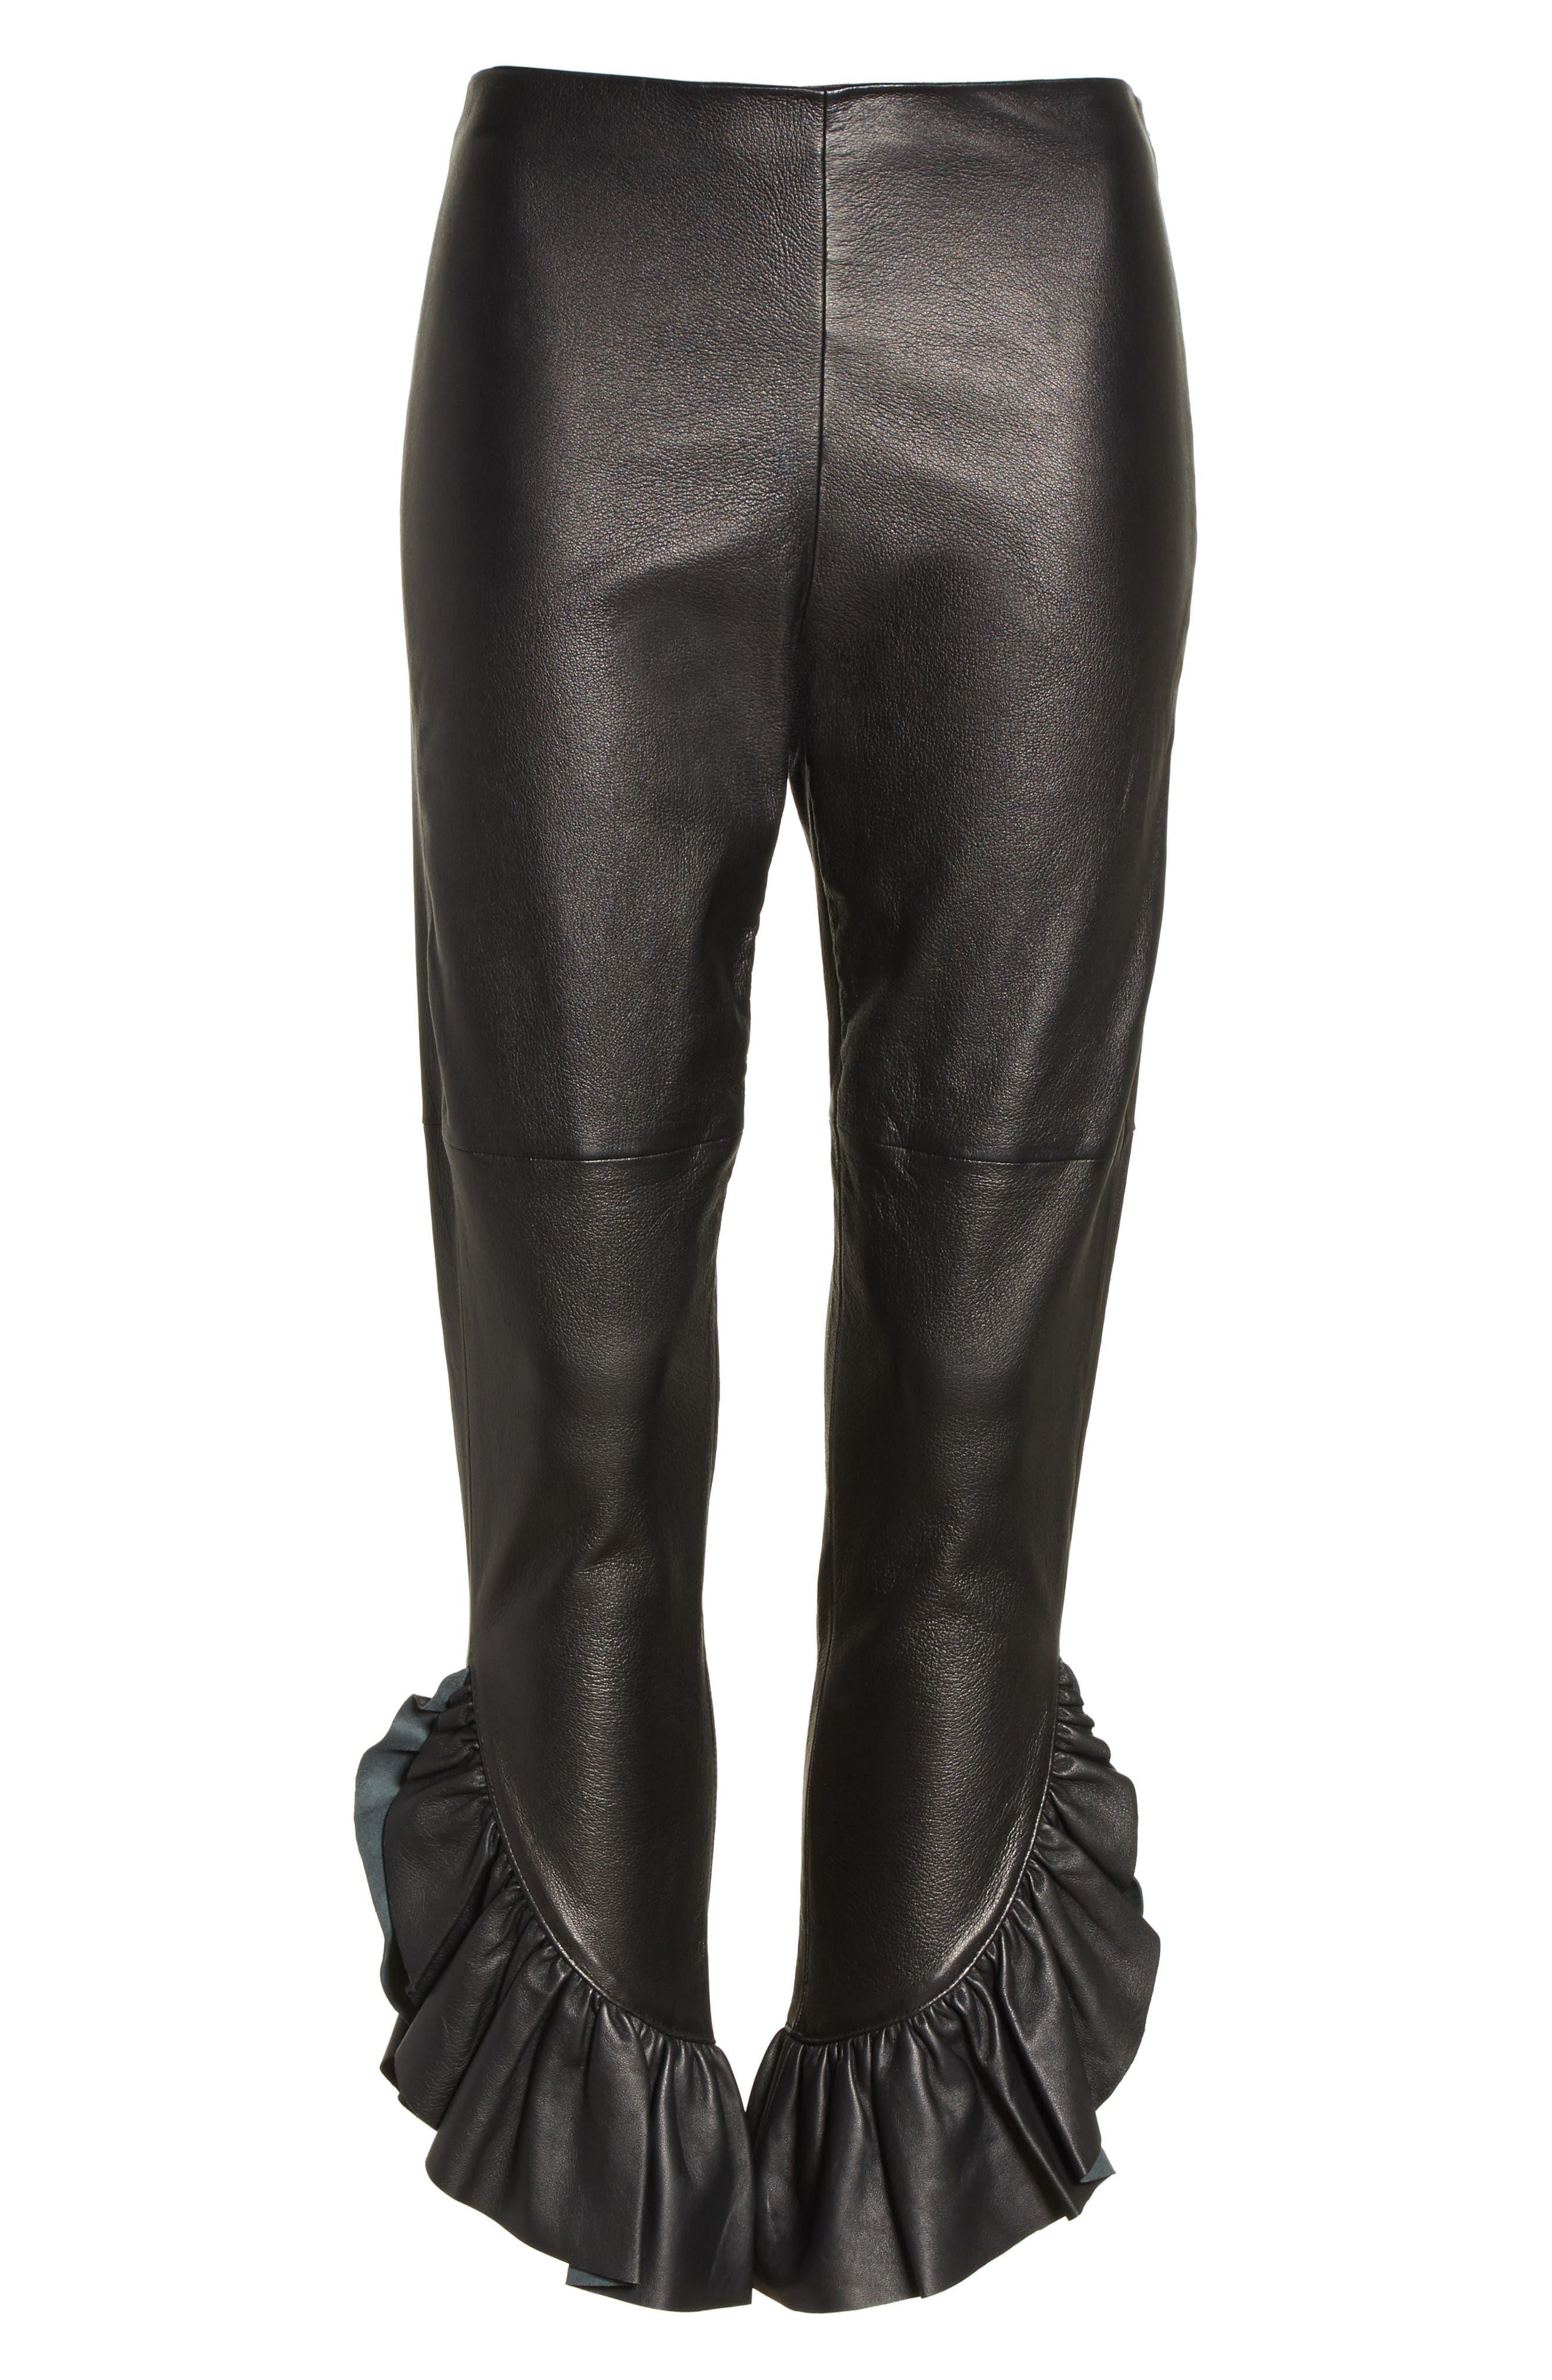 Gionata Ruffle Hem Leather Pants,                             Alternate thumbnail 6, color,